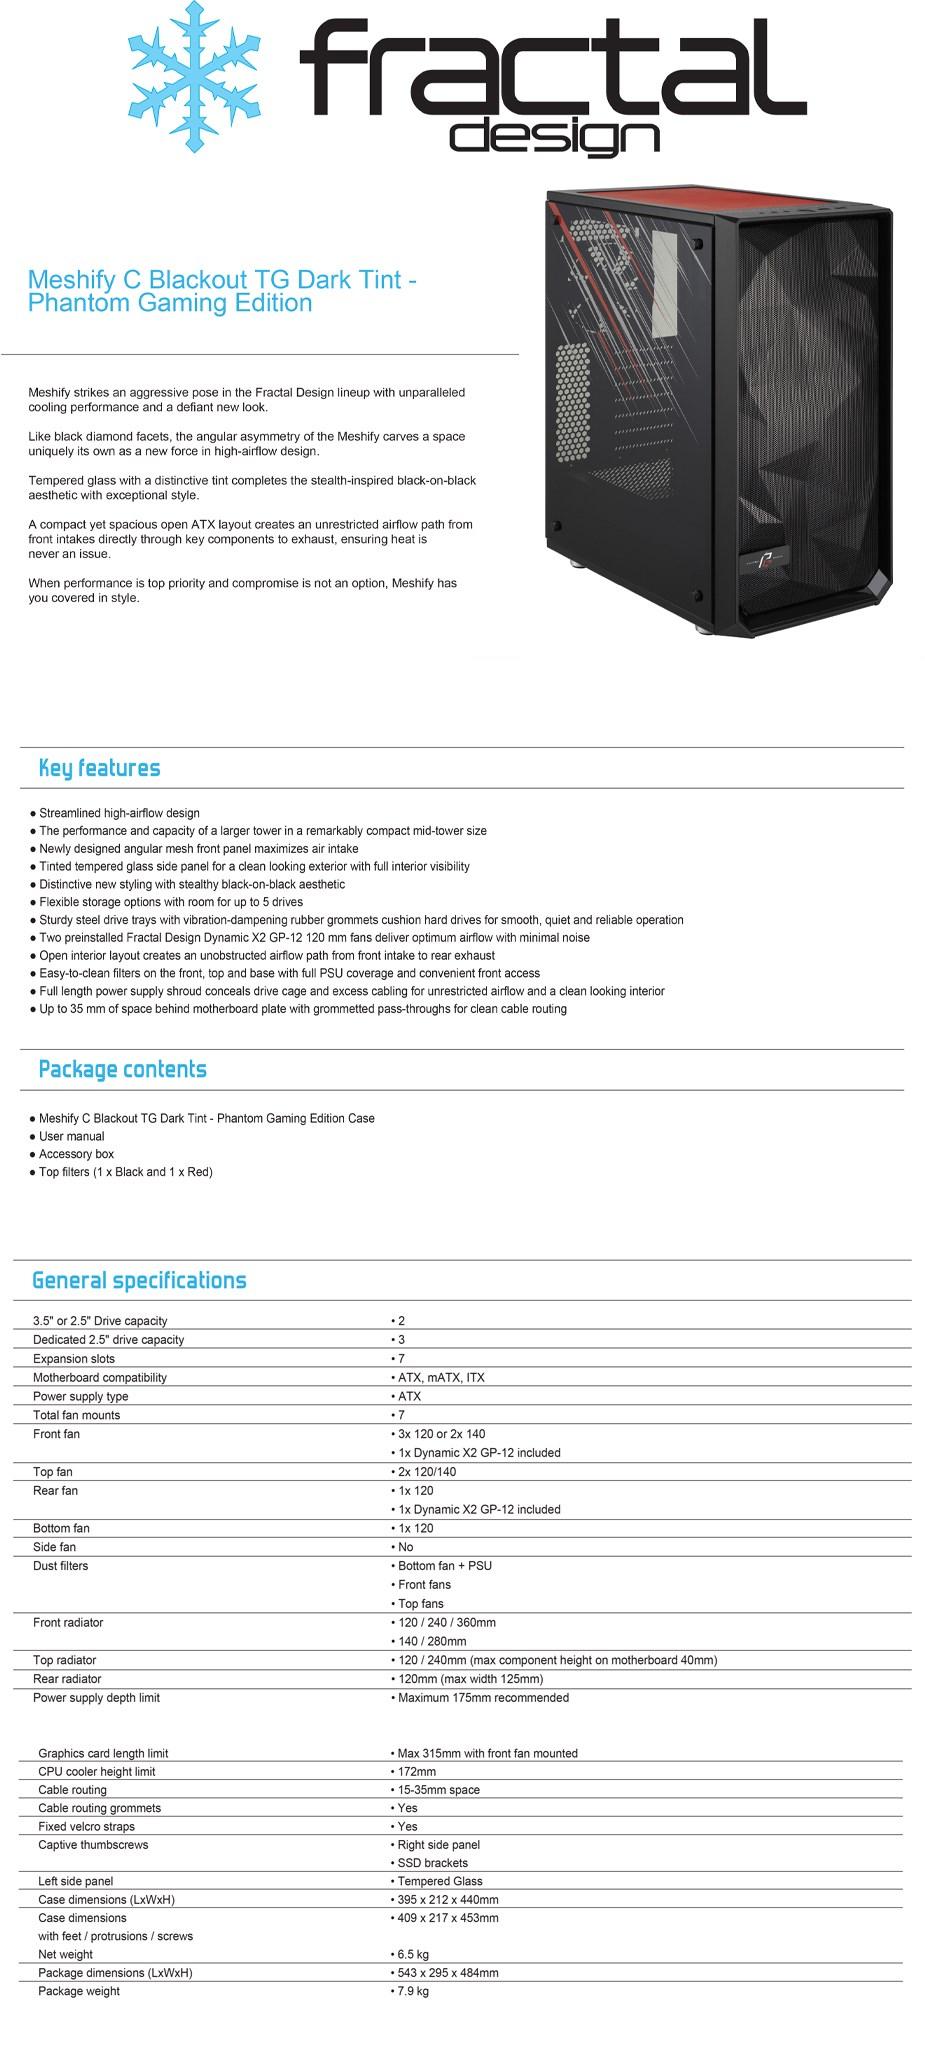 Fractal Design Meshify C Blackout Dark Tint TG - Phantom Gaming Edition - Overview 1